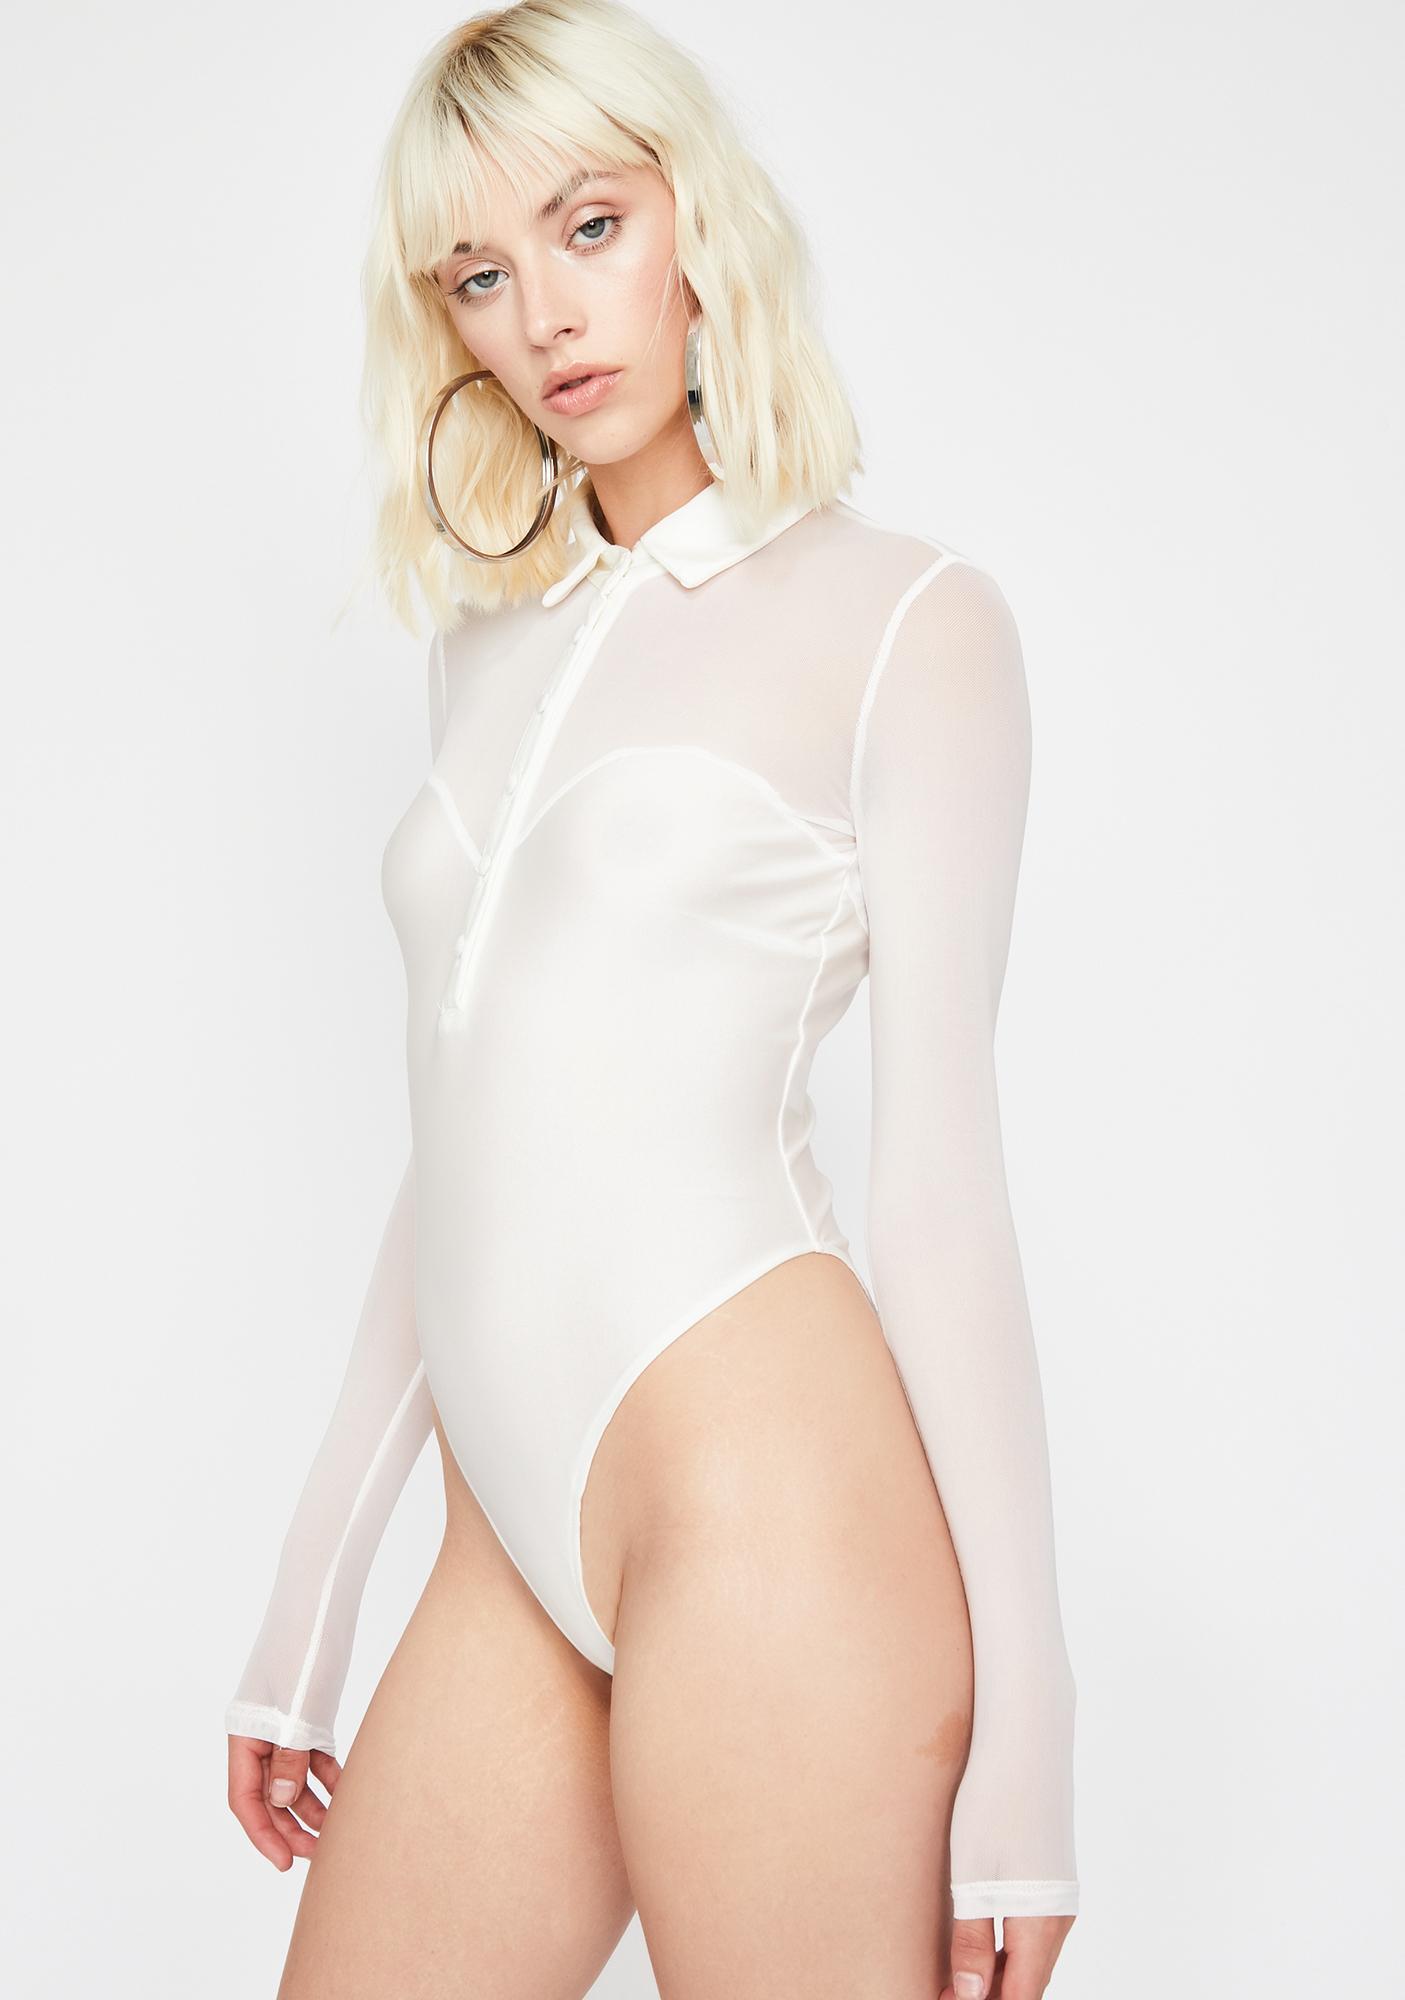 Icy Electrik Vixen Polo Bodysuit